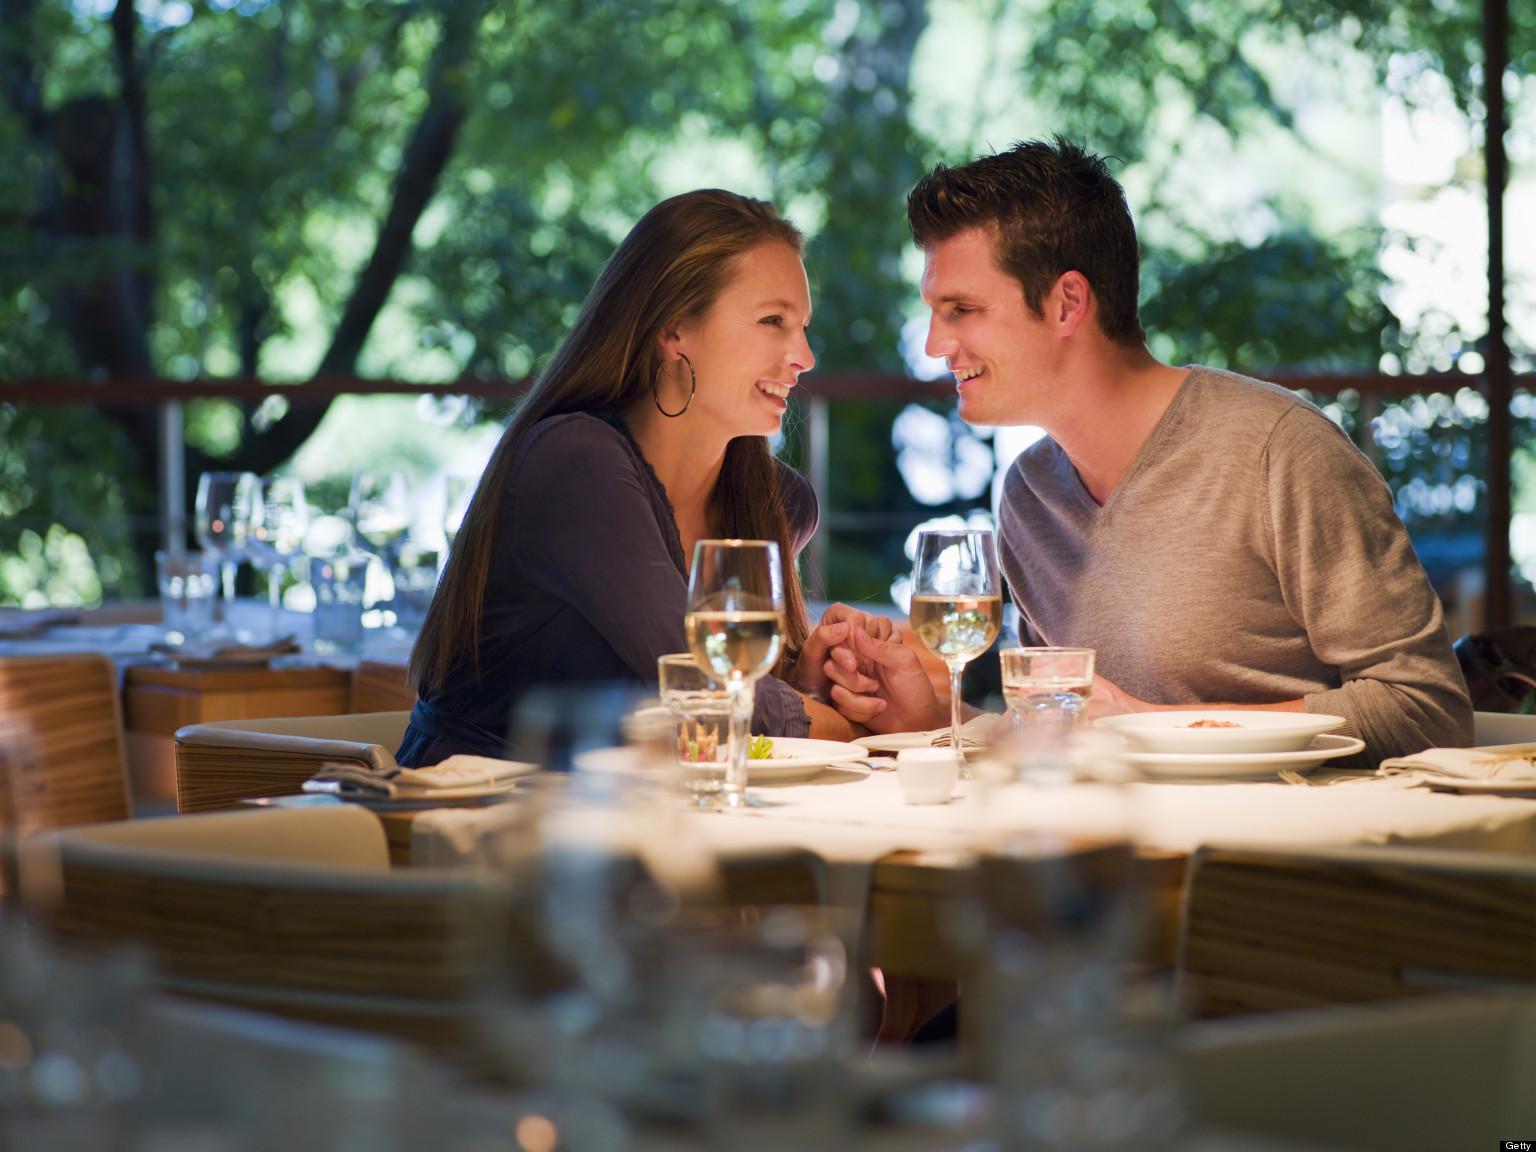 Net dating etiquette